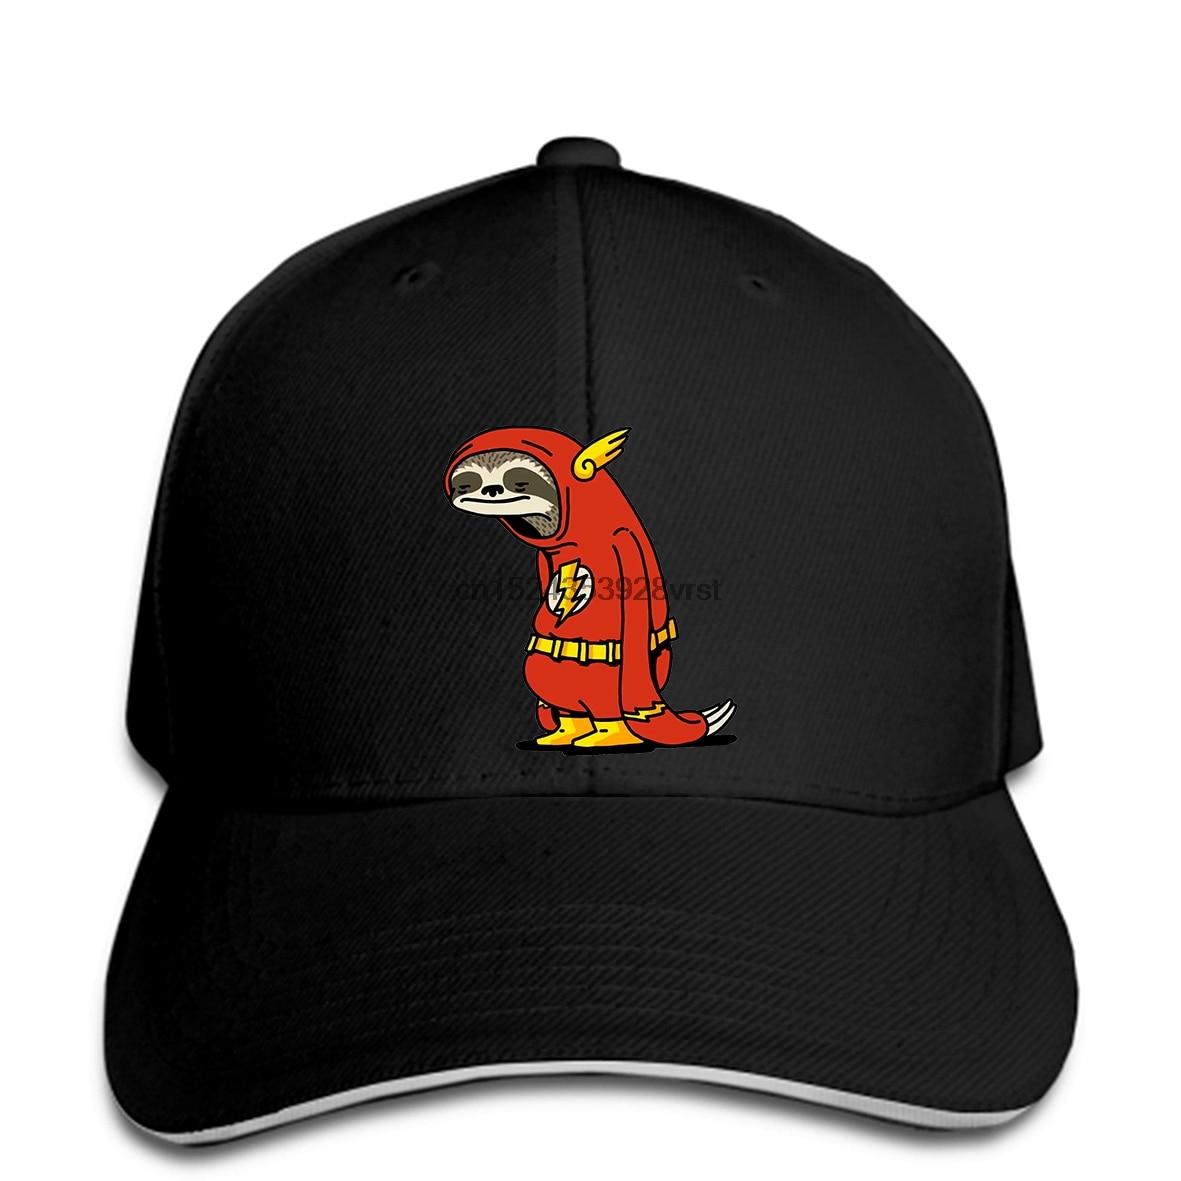 Boné de beisebol uomo divertente flash sloth devo andare veloce artsy snapback chapéu pico